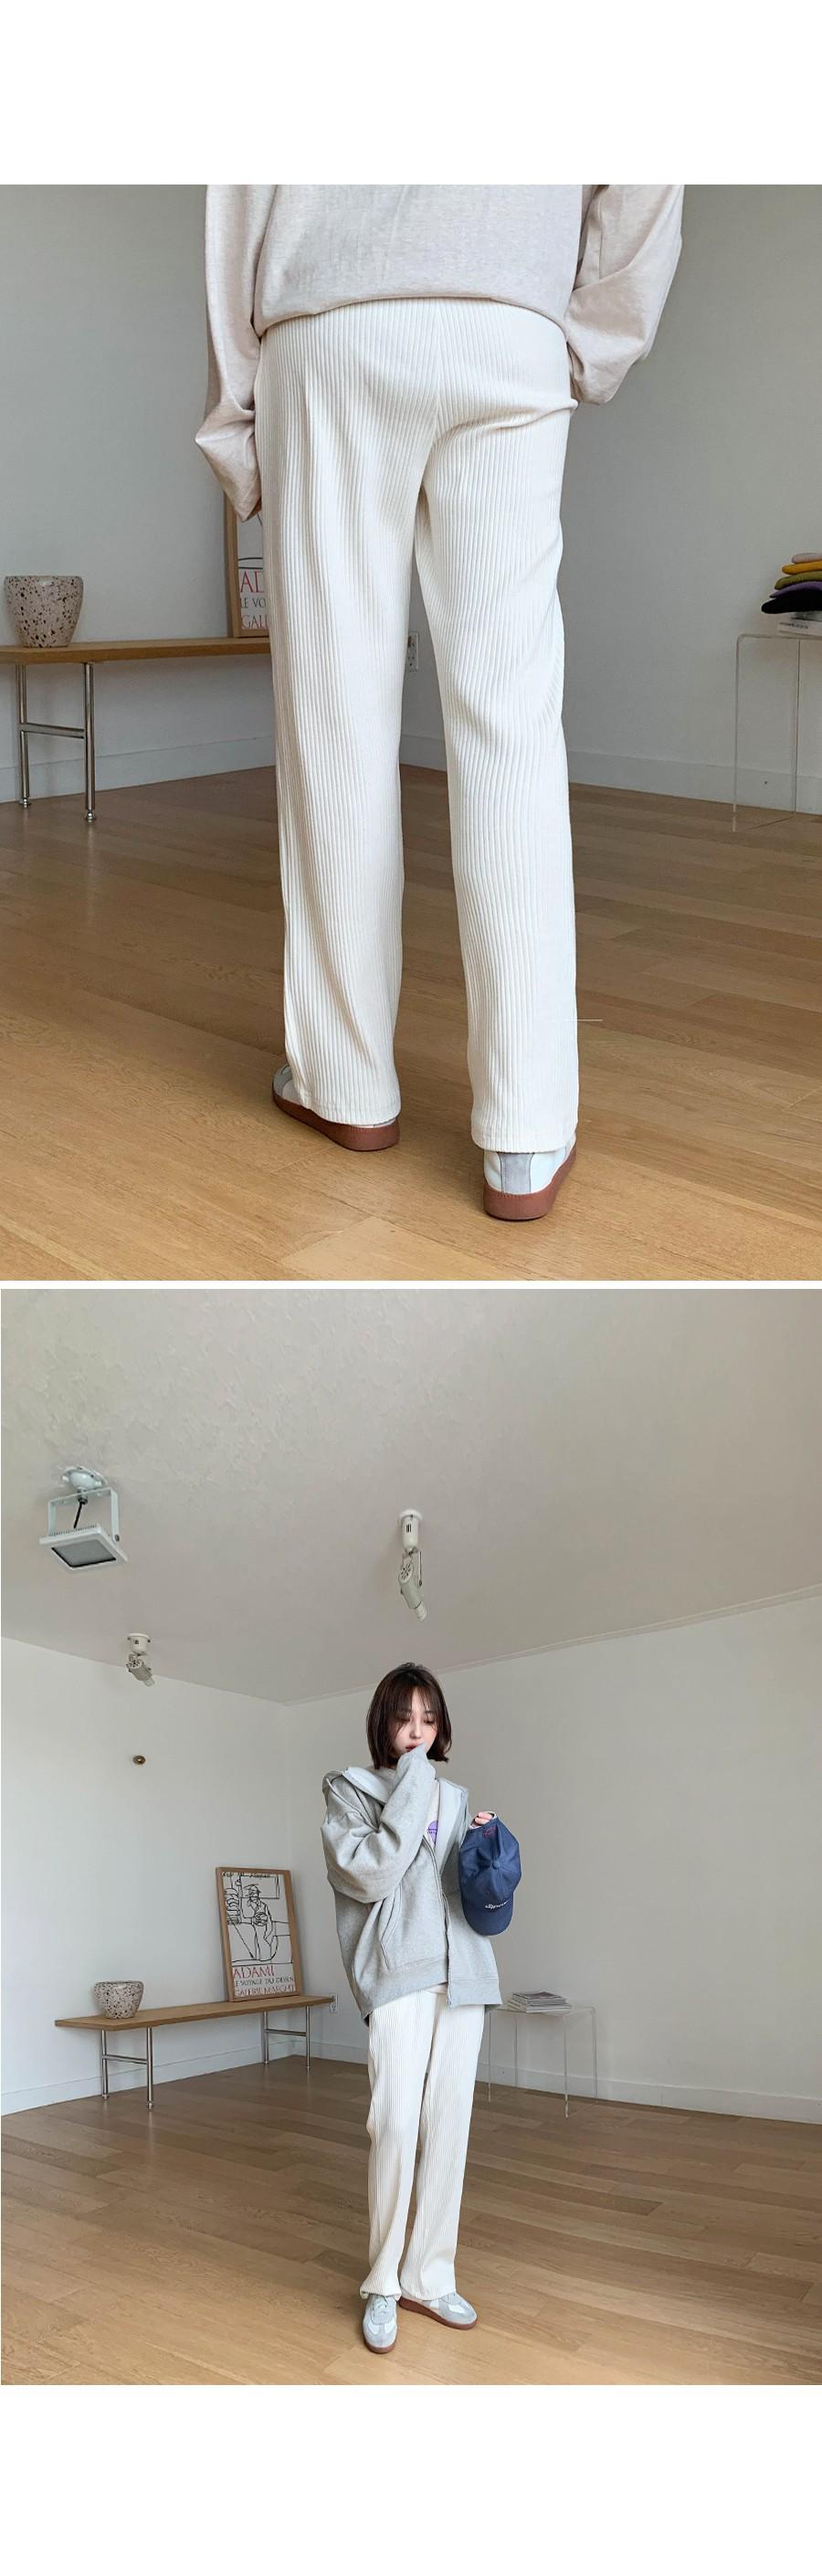 Ribbed-knit training pants